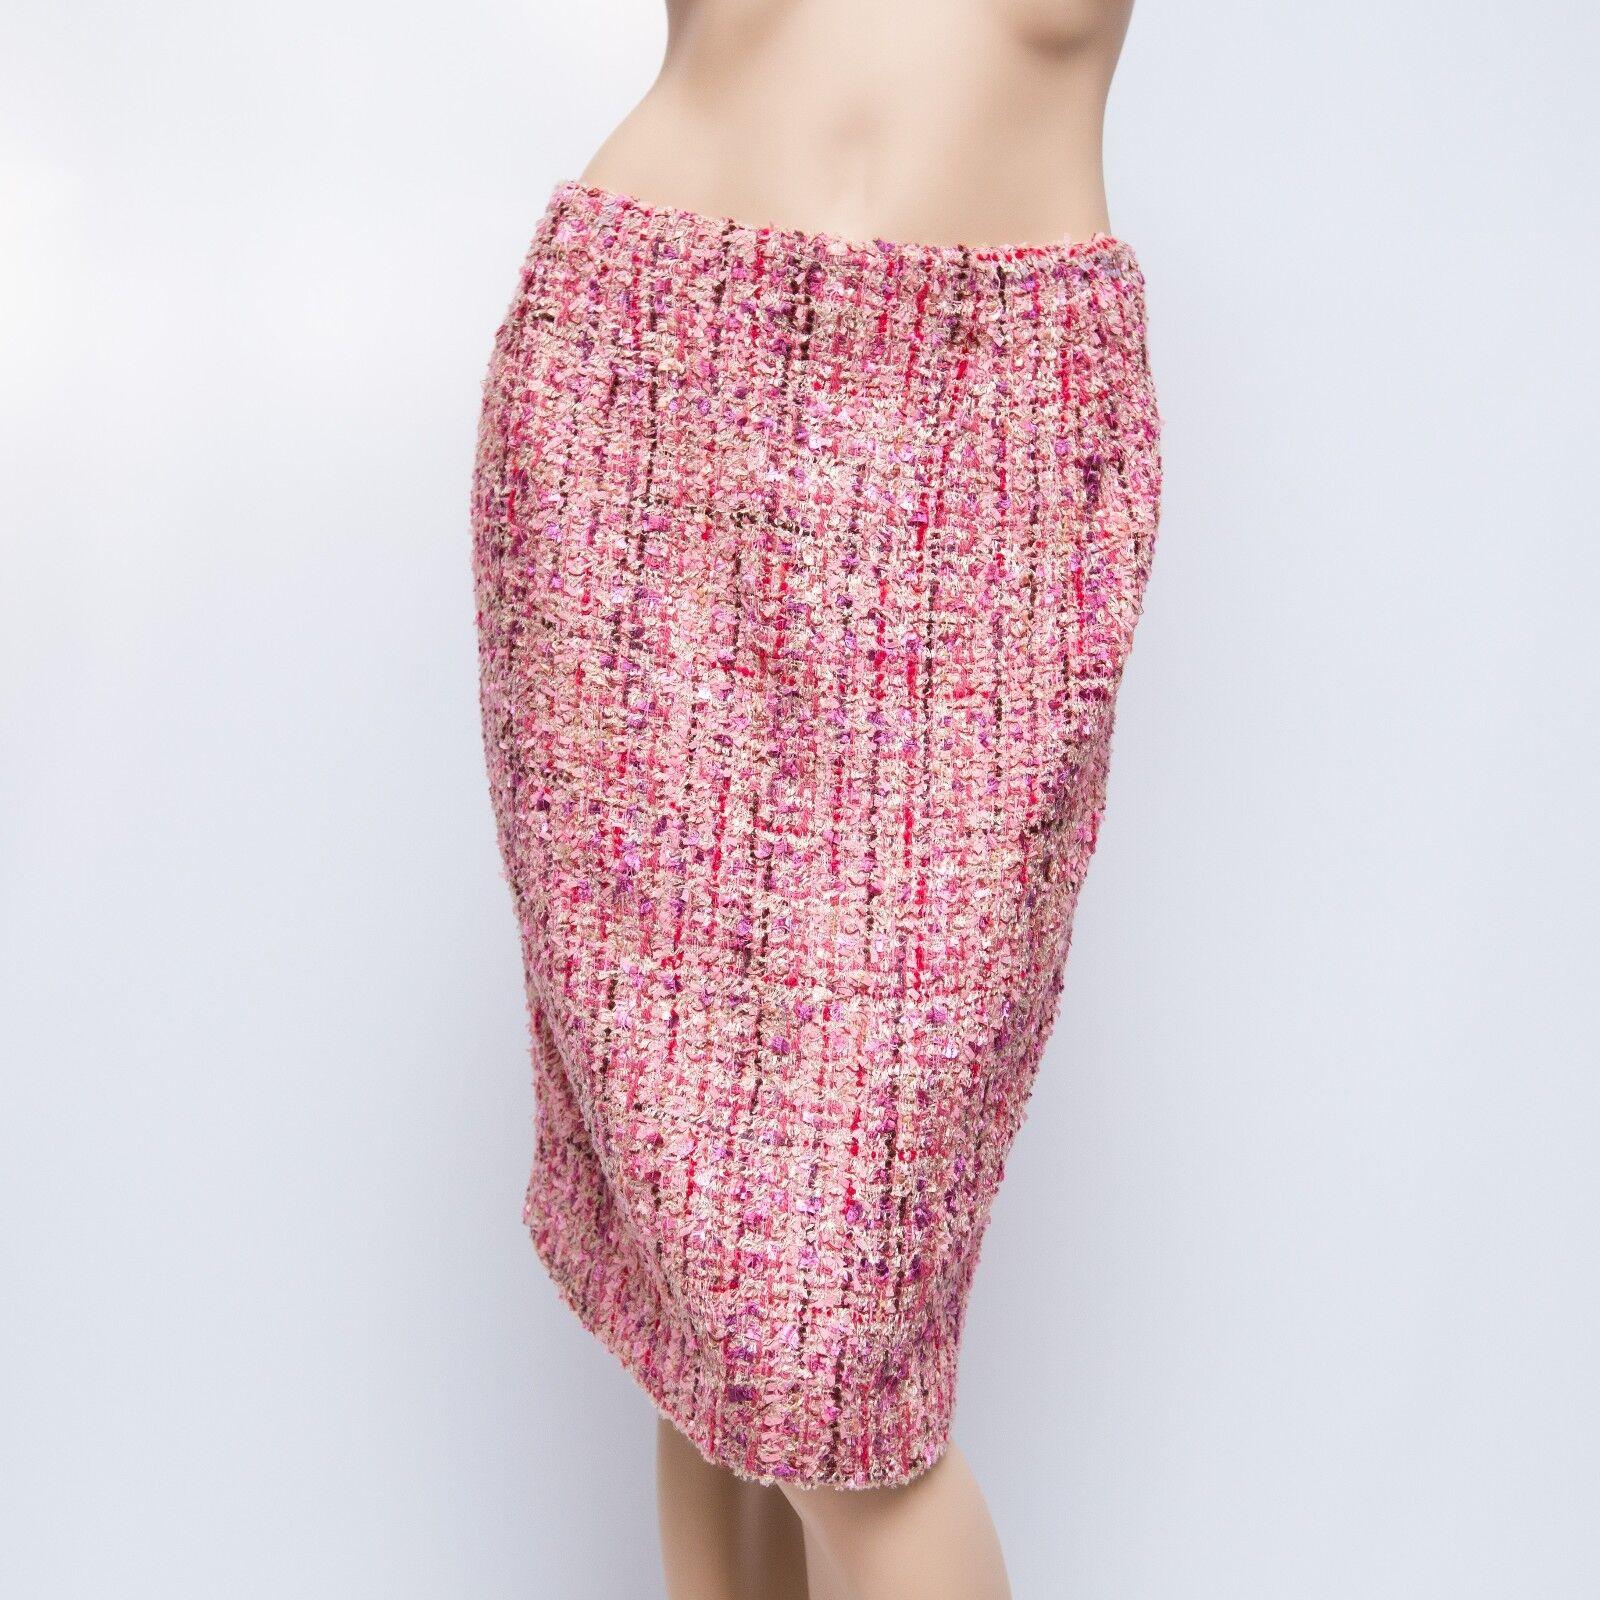 Renato Nucci Pink Couture Skirt  498 US6